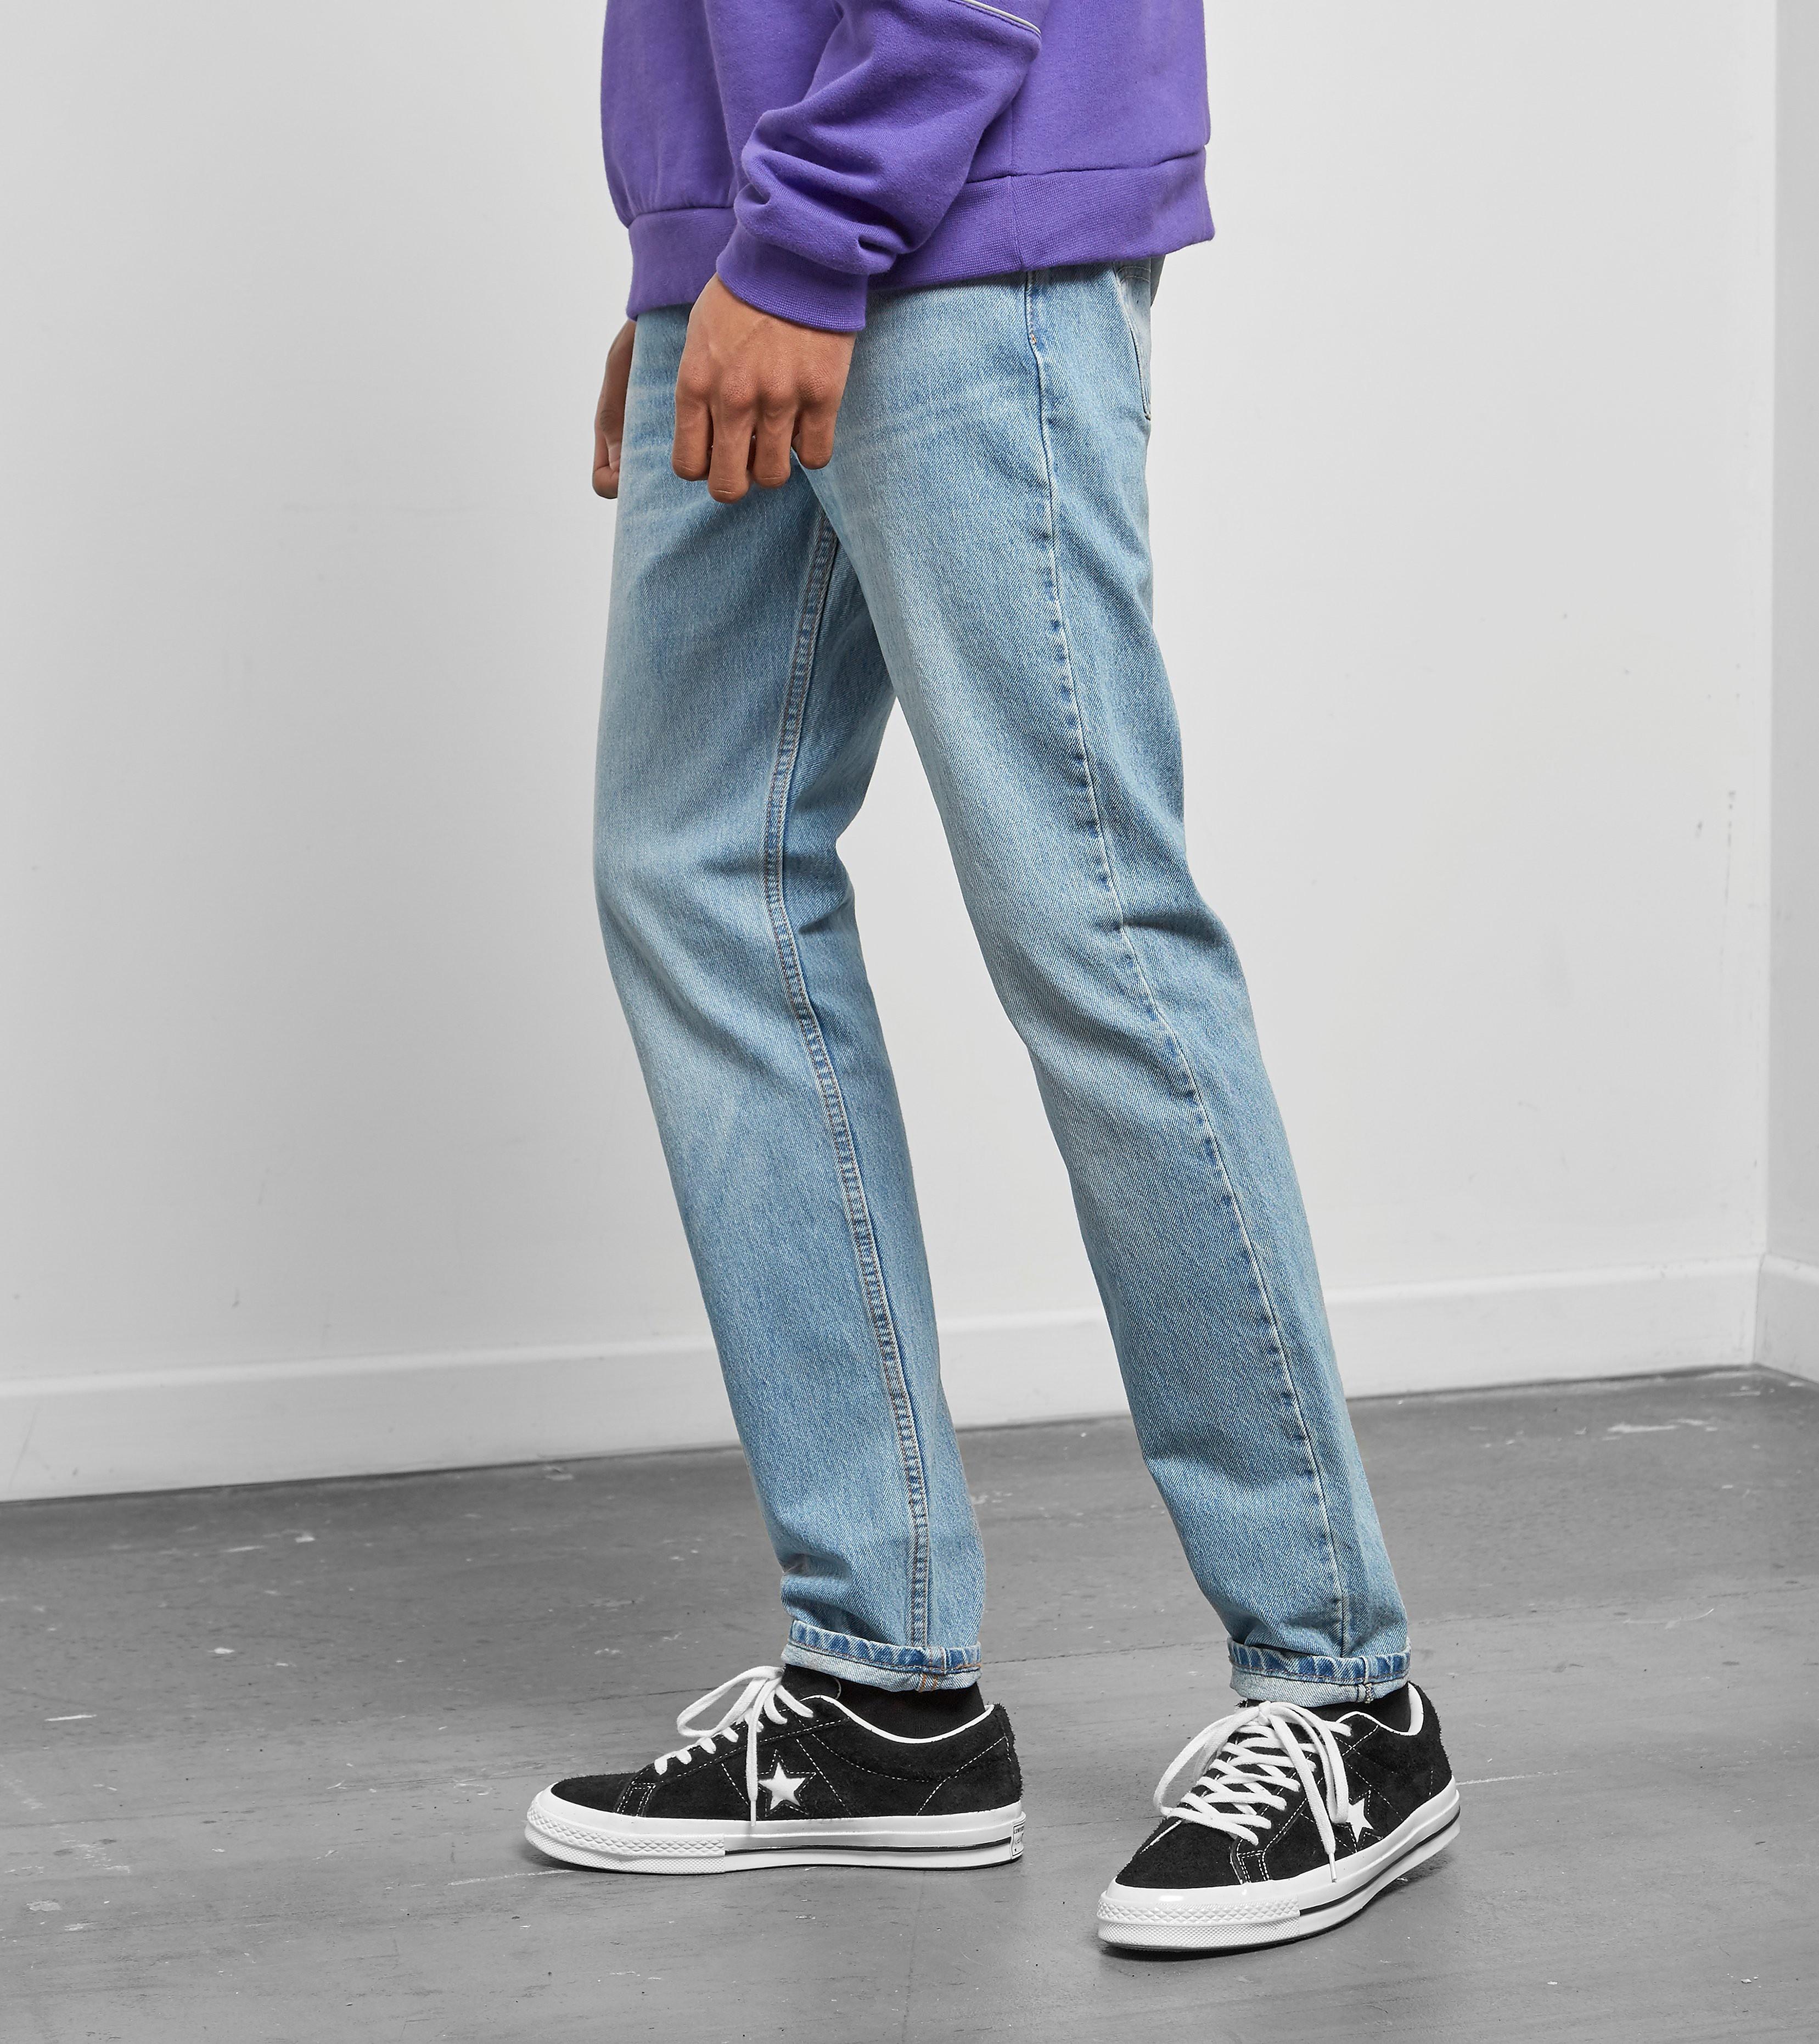 Levis 510 Skinny Fit Warp Stretch Jeans